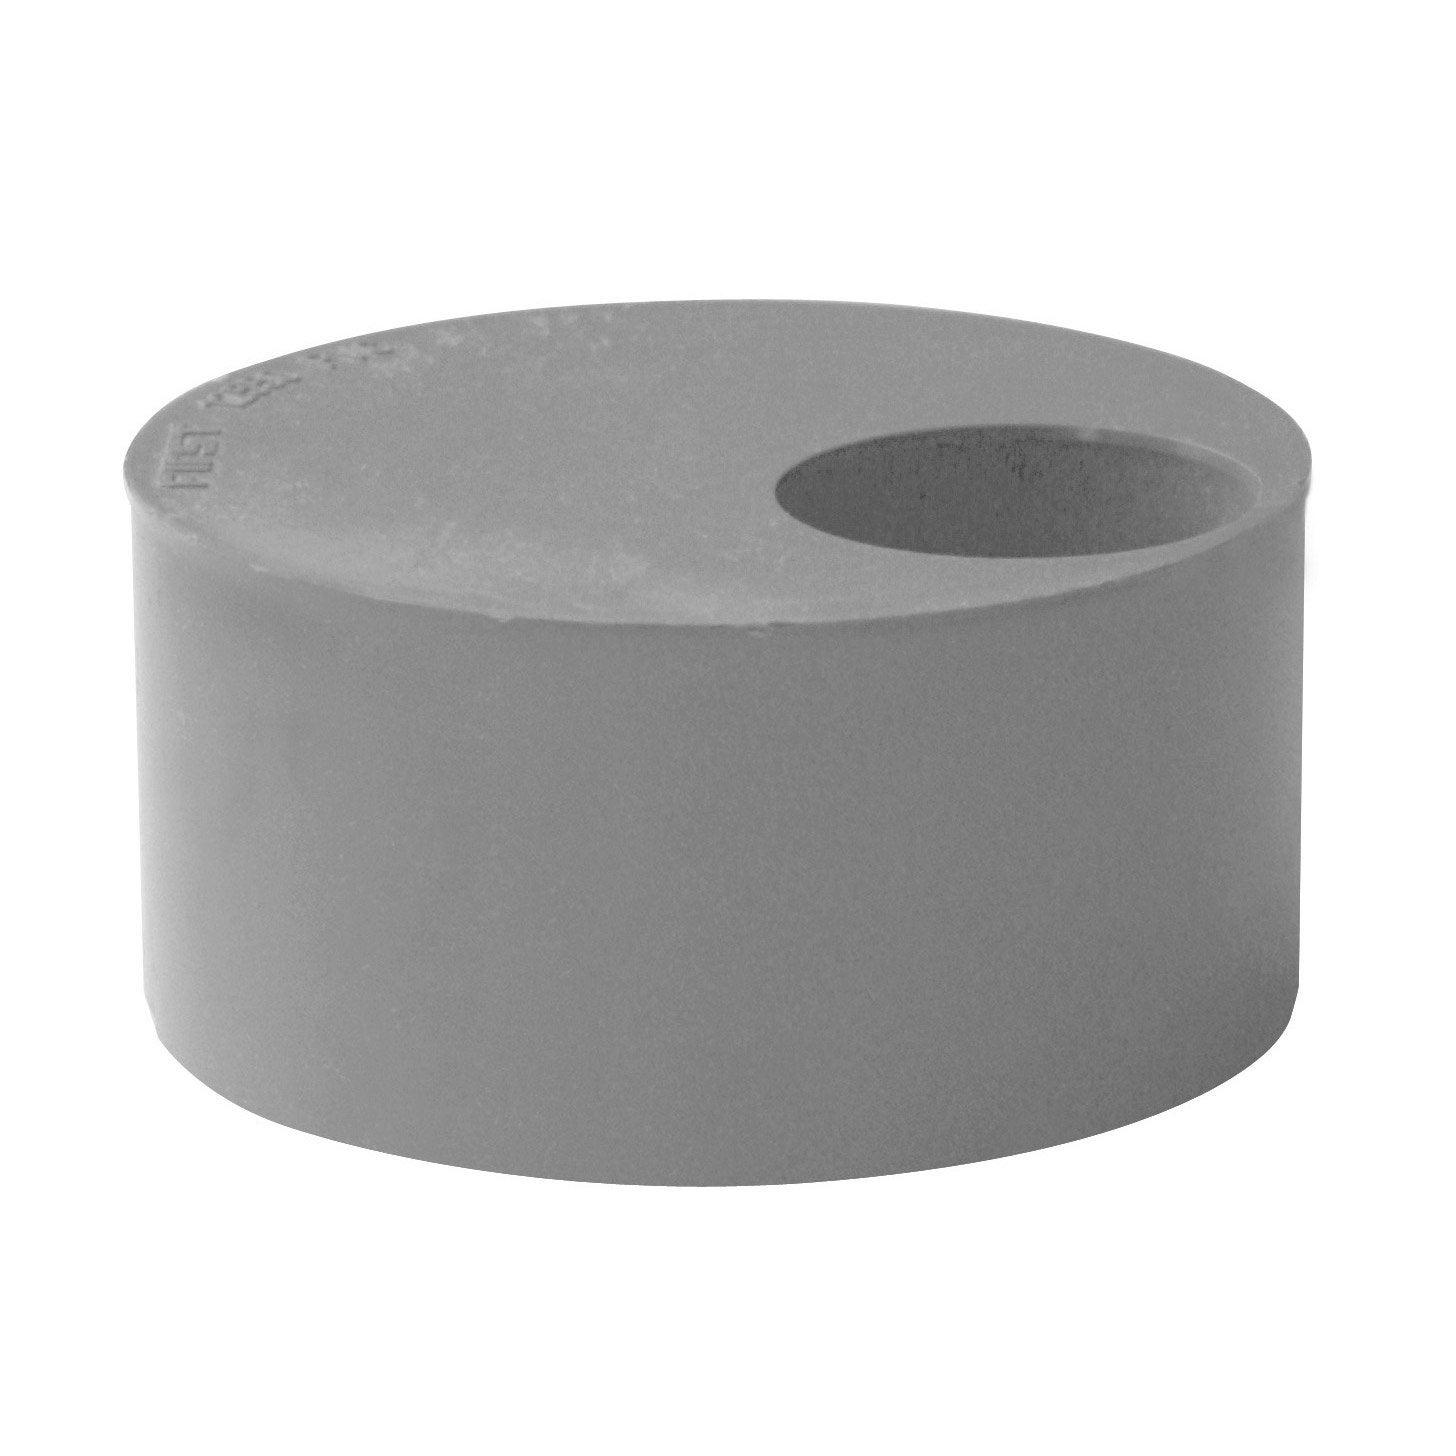 tampon de r duction en pvc diam tre 80 40mm leroy merlin. Black Bedroom Furniture Sets. Home Design Ideas